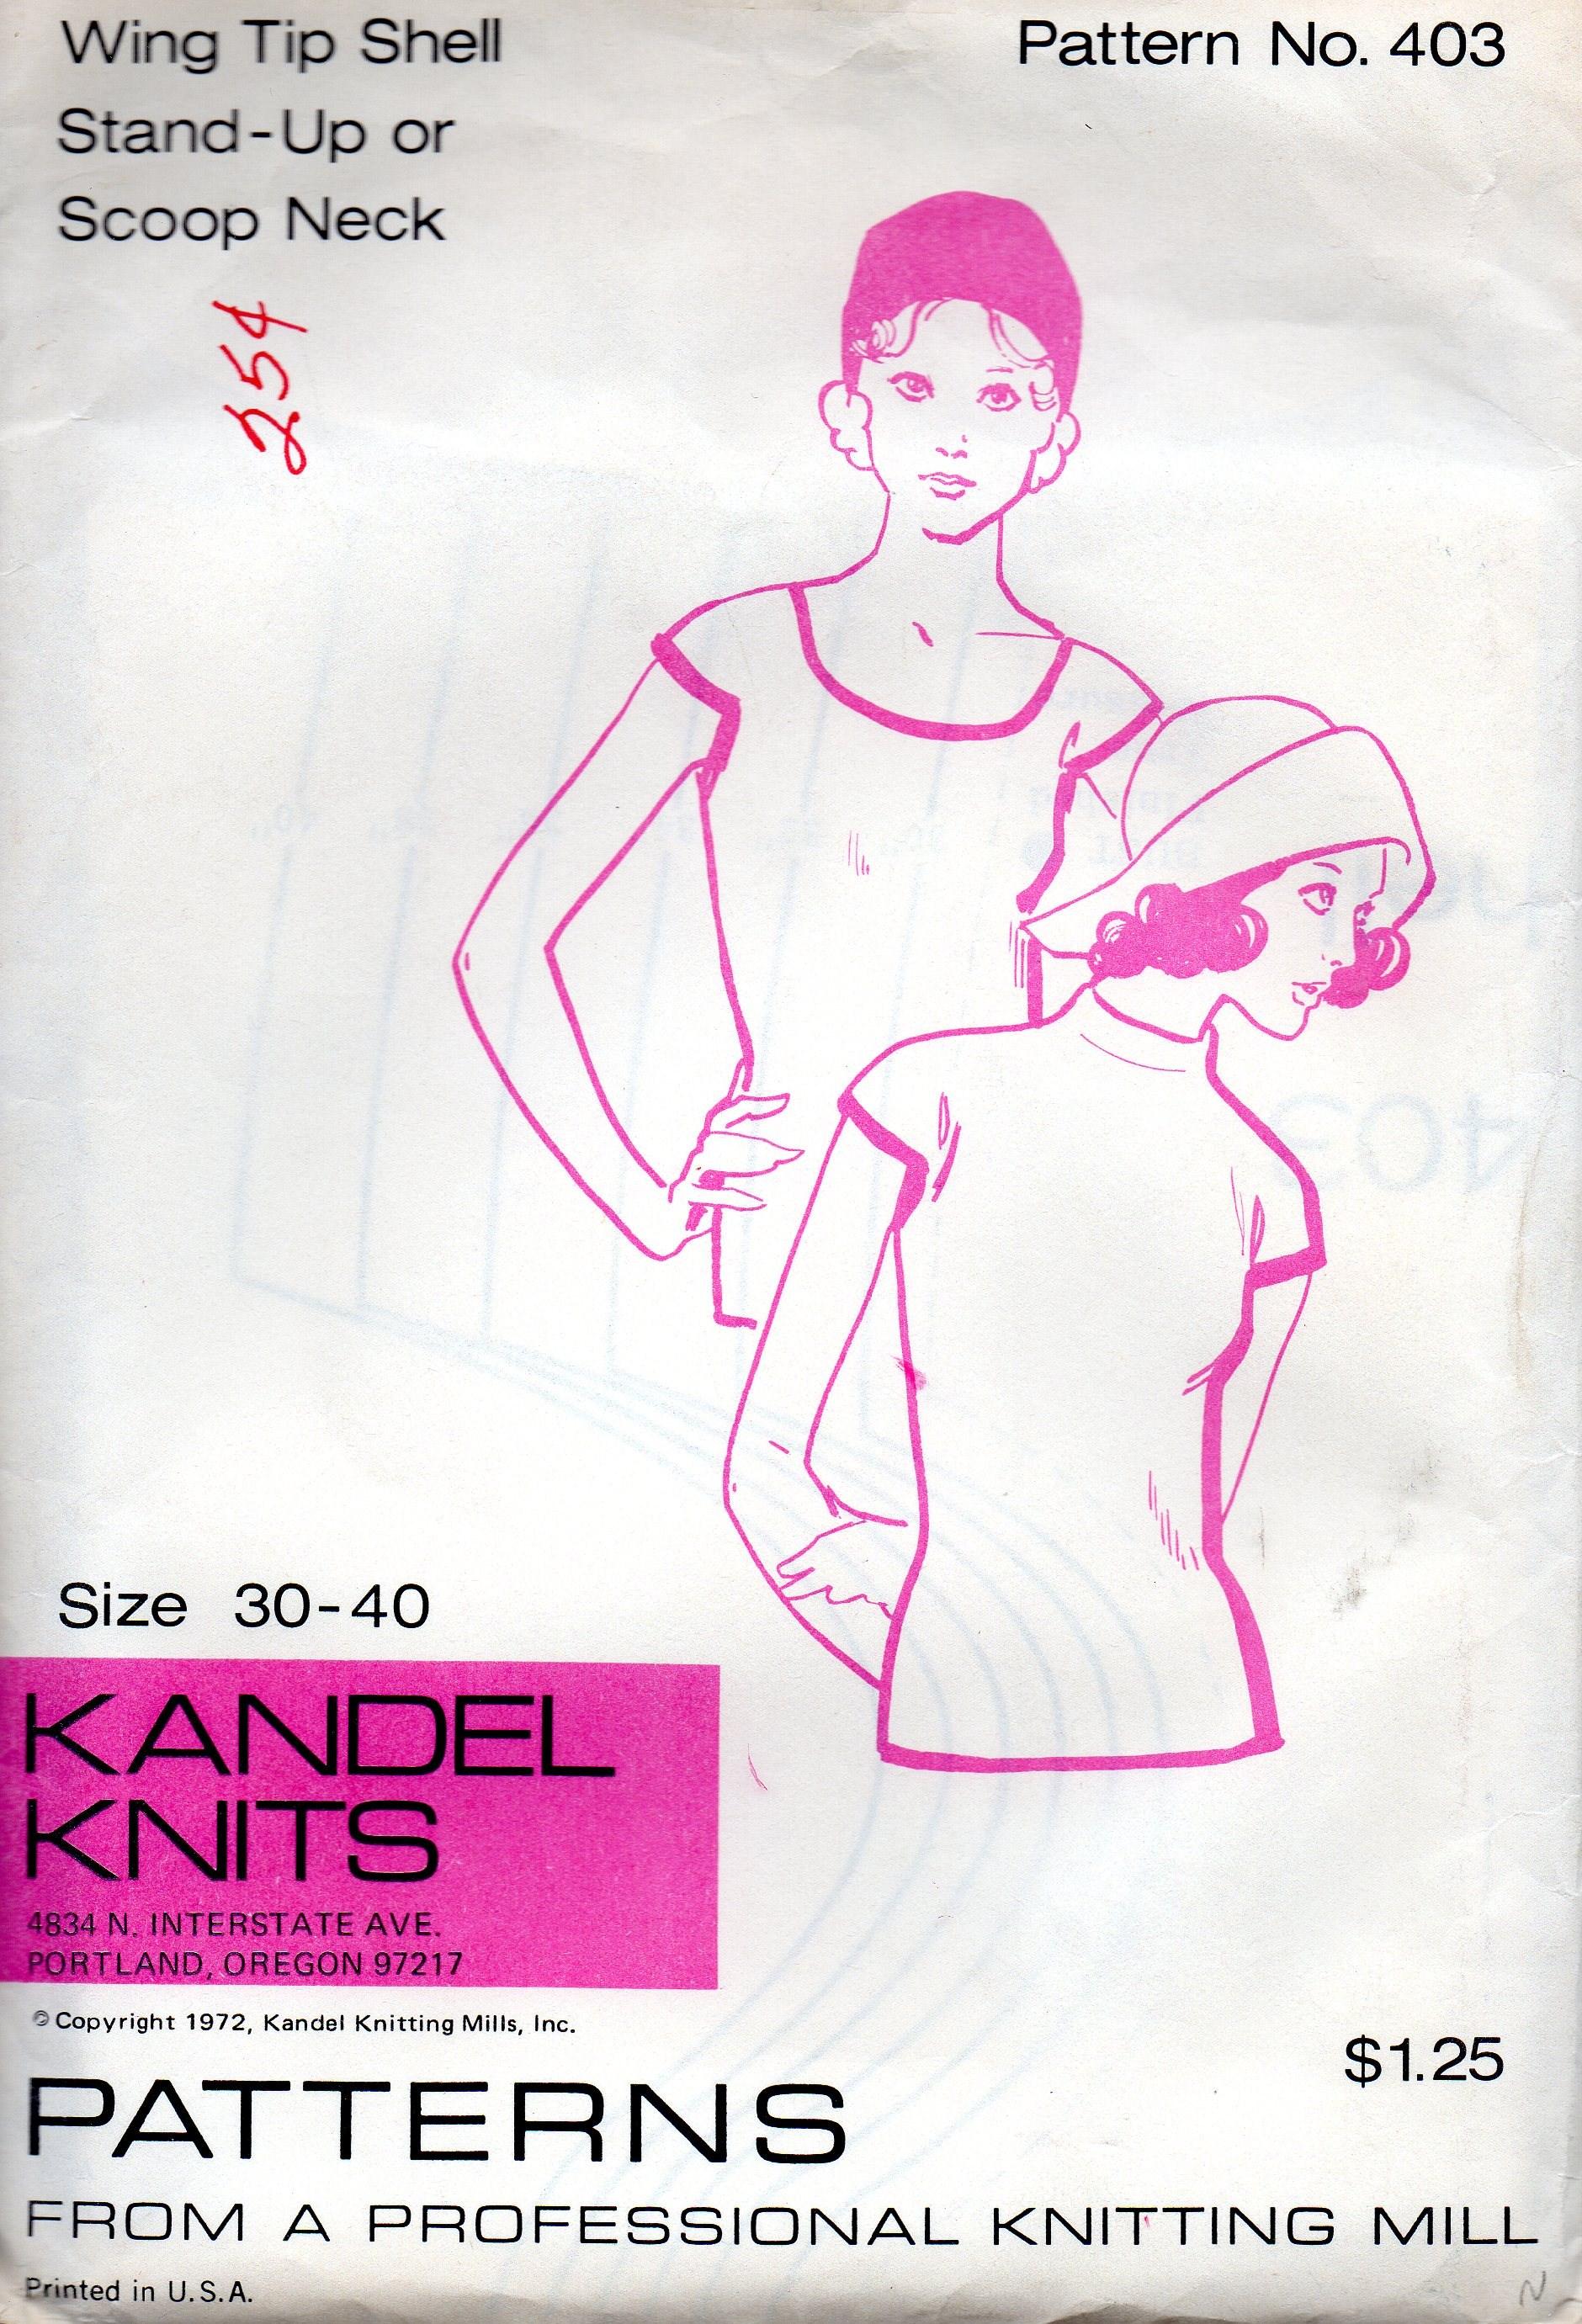 Kandel Knits 403